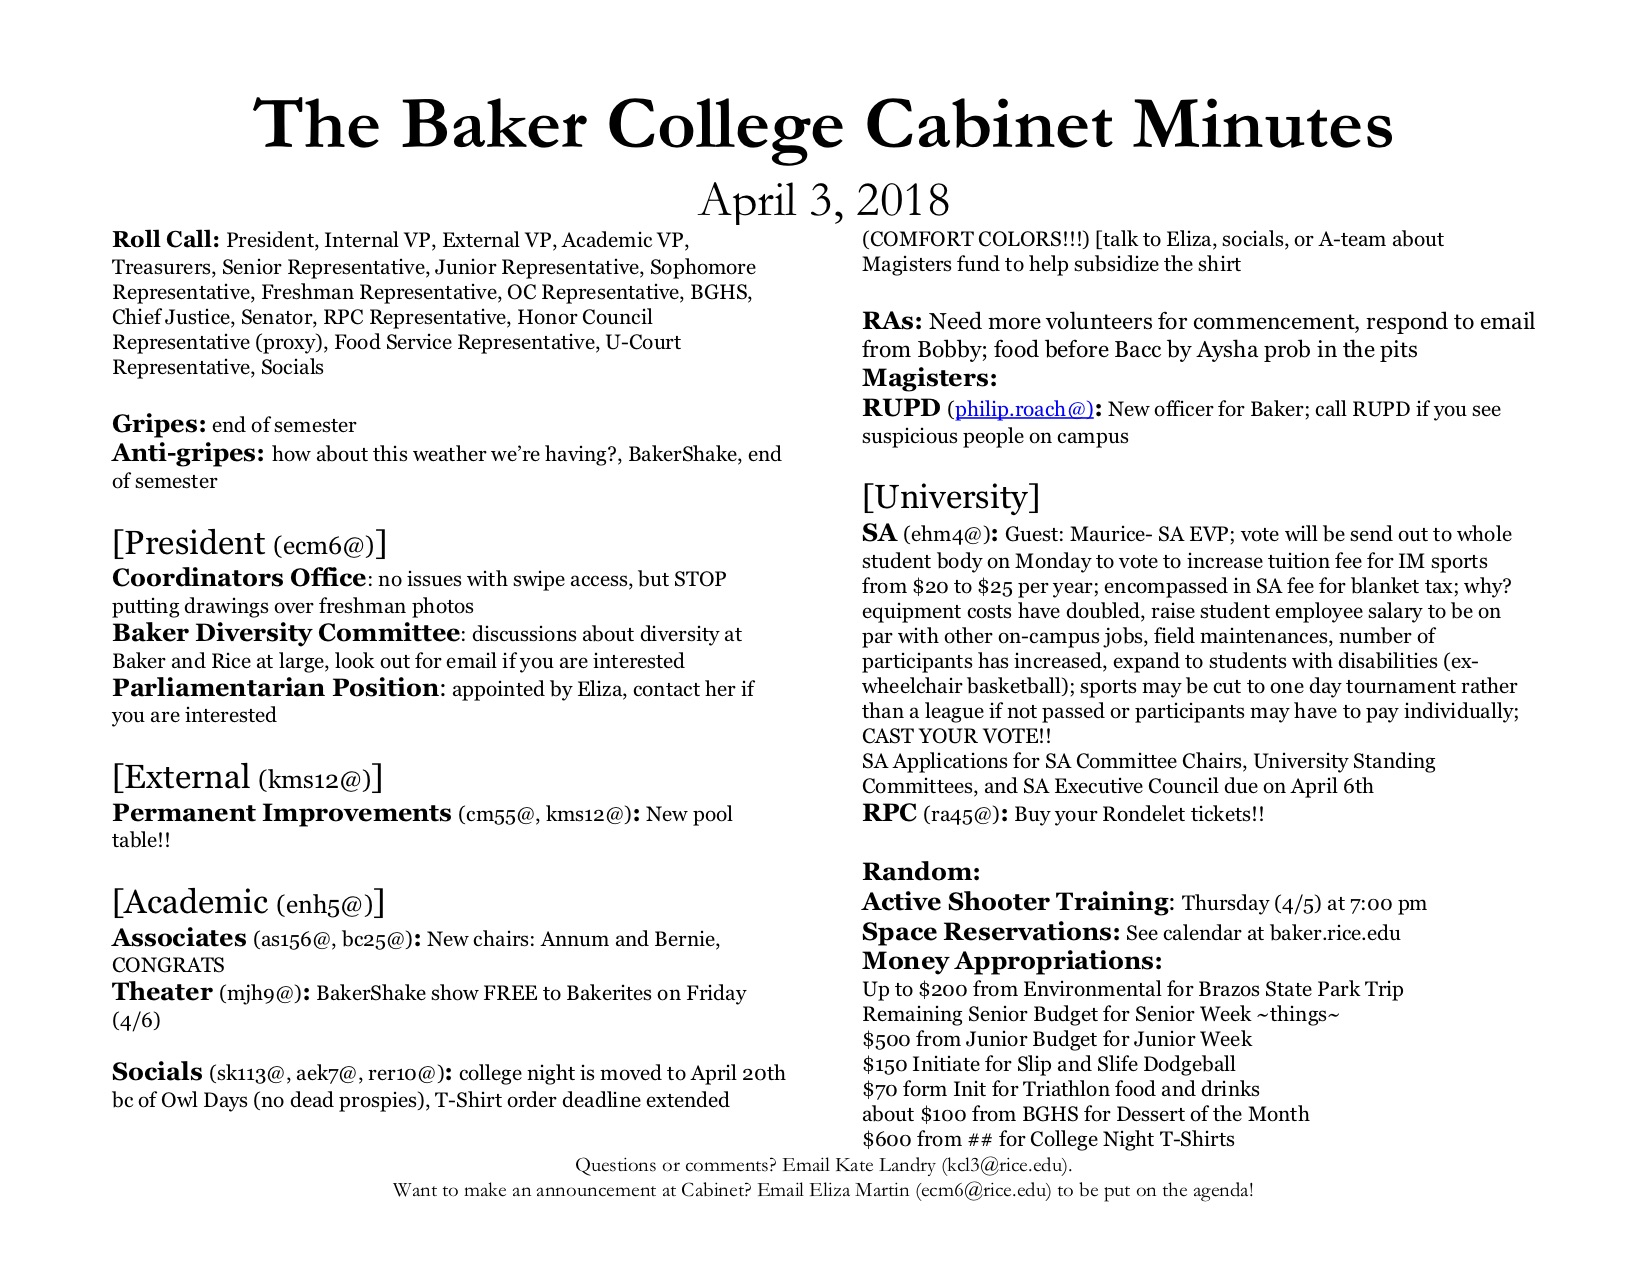 Cab Notes April4 .jpg